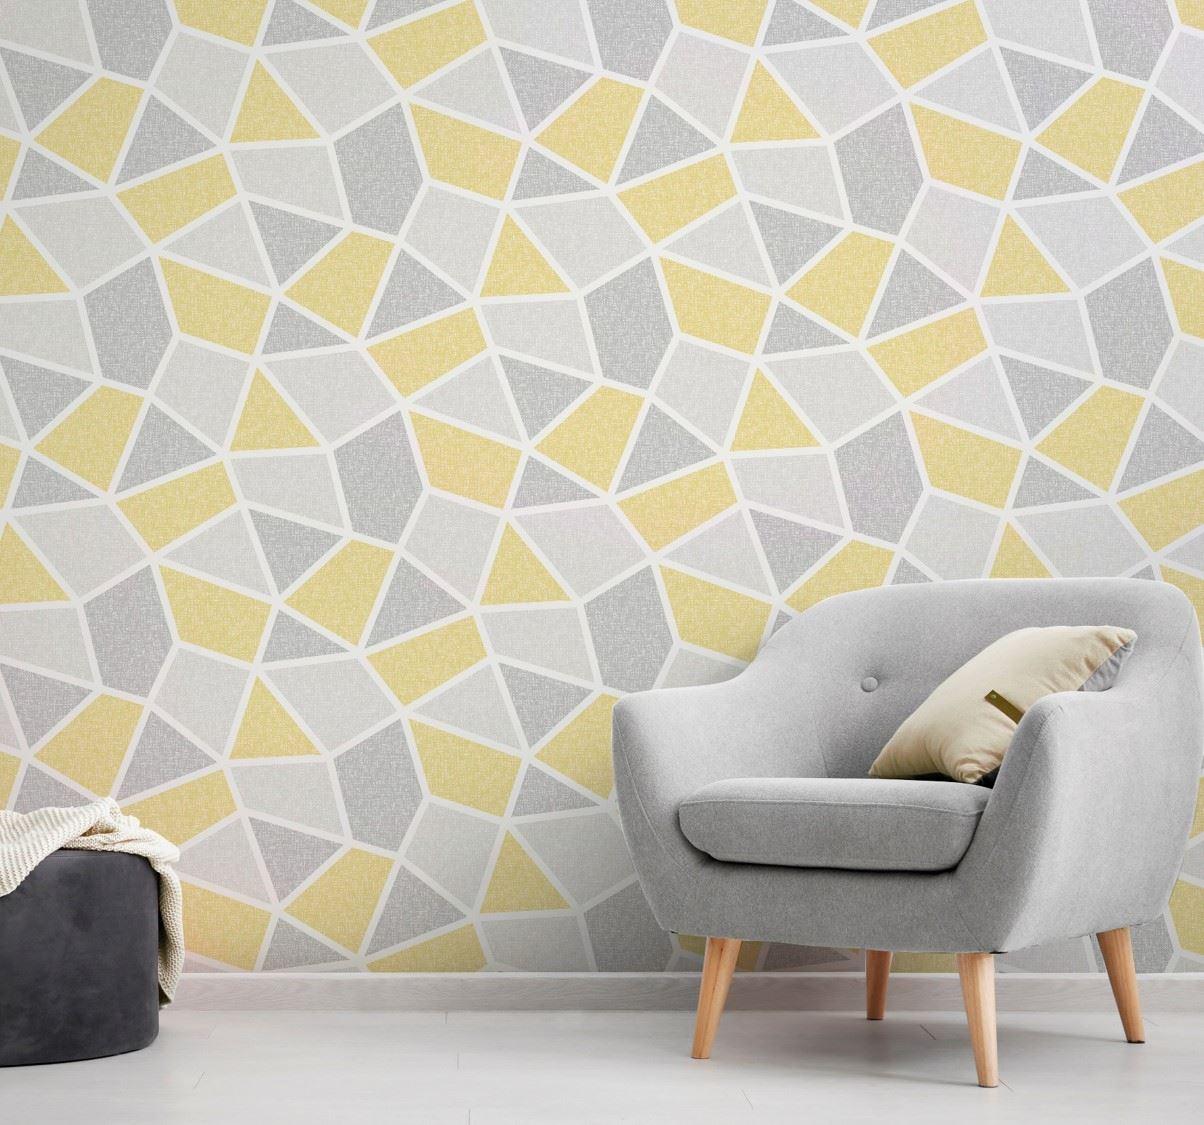 Crown Geometric Wallpaper Luxury Textured Vinyl Modern